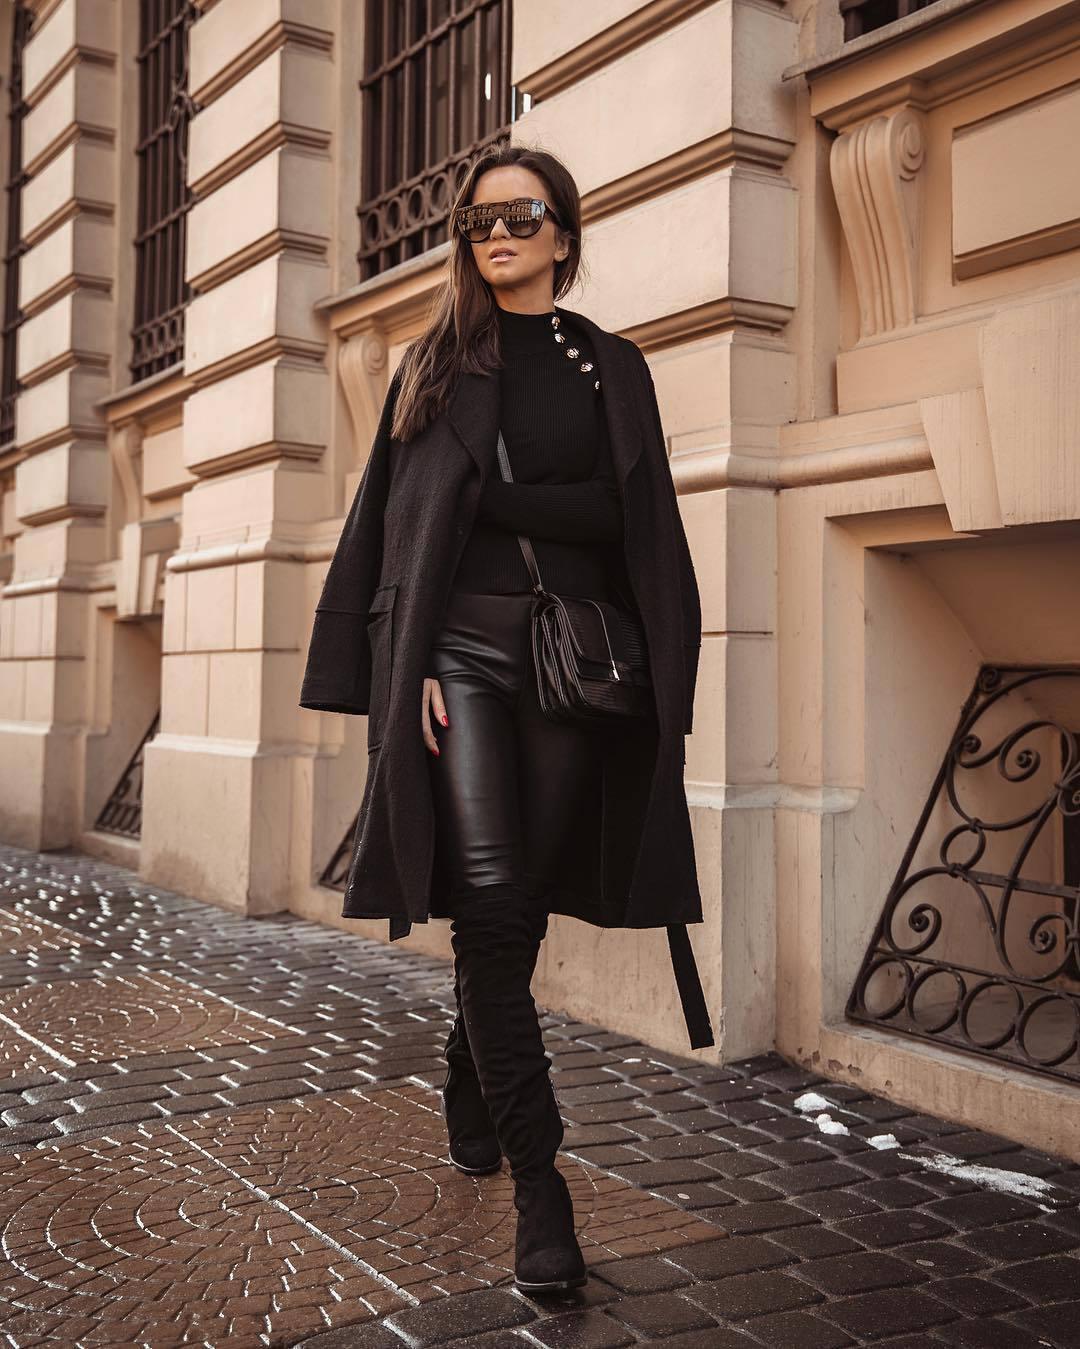 bag black bag zara crossbody bag over the knee boots black boots leather leggings black coat black sweater